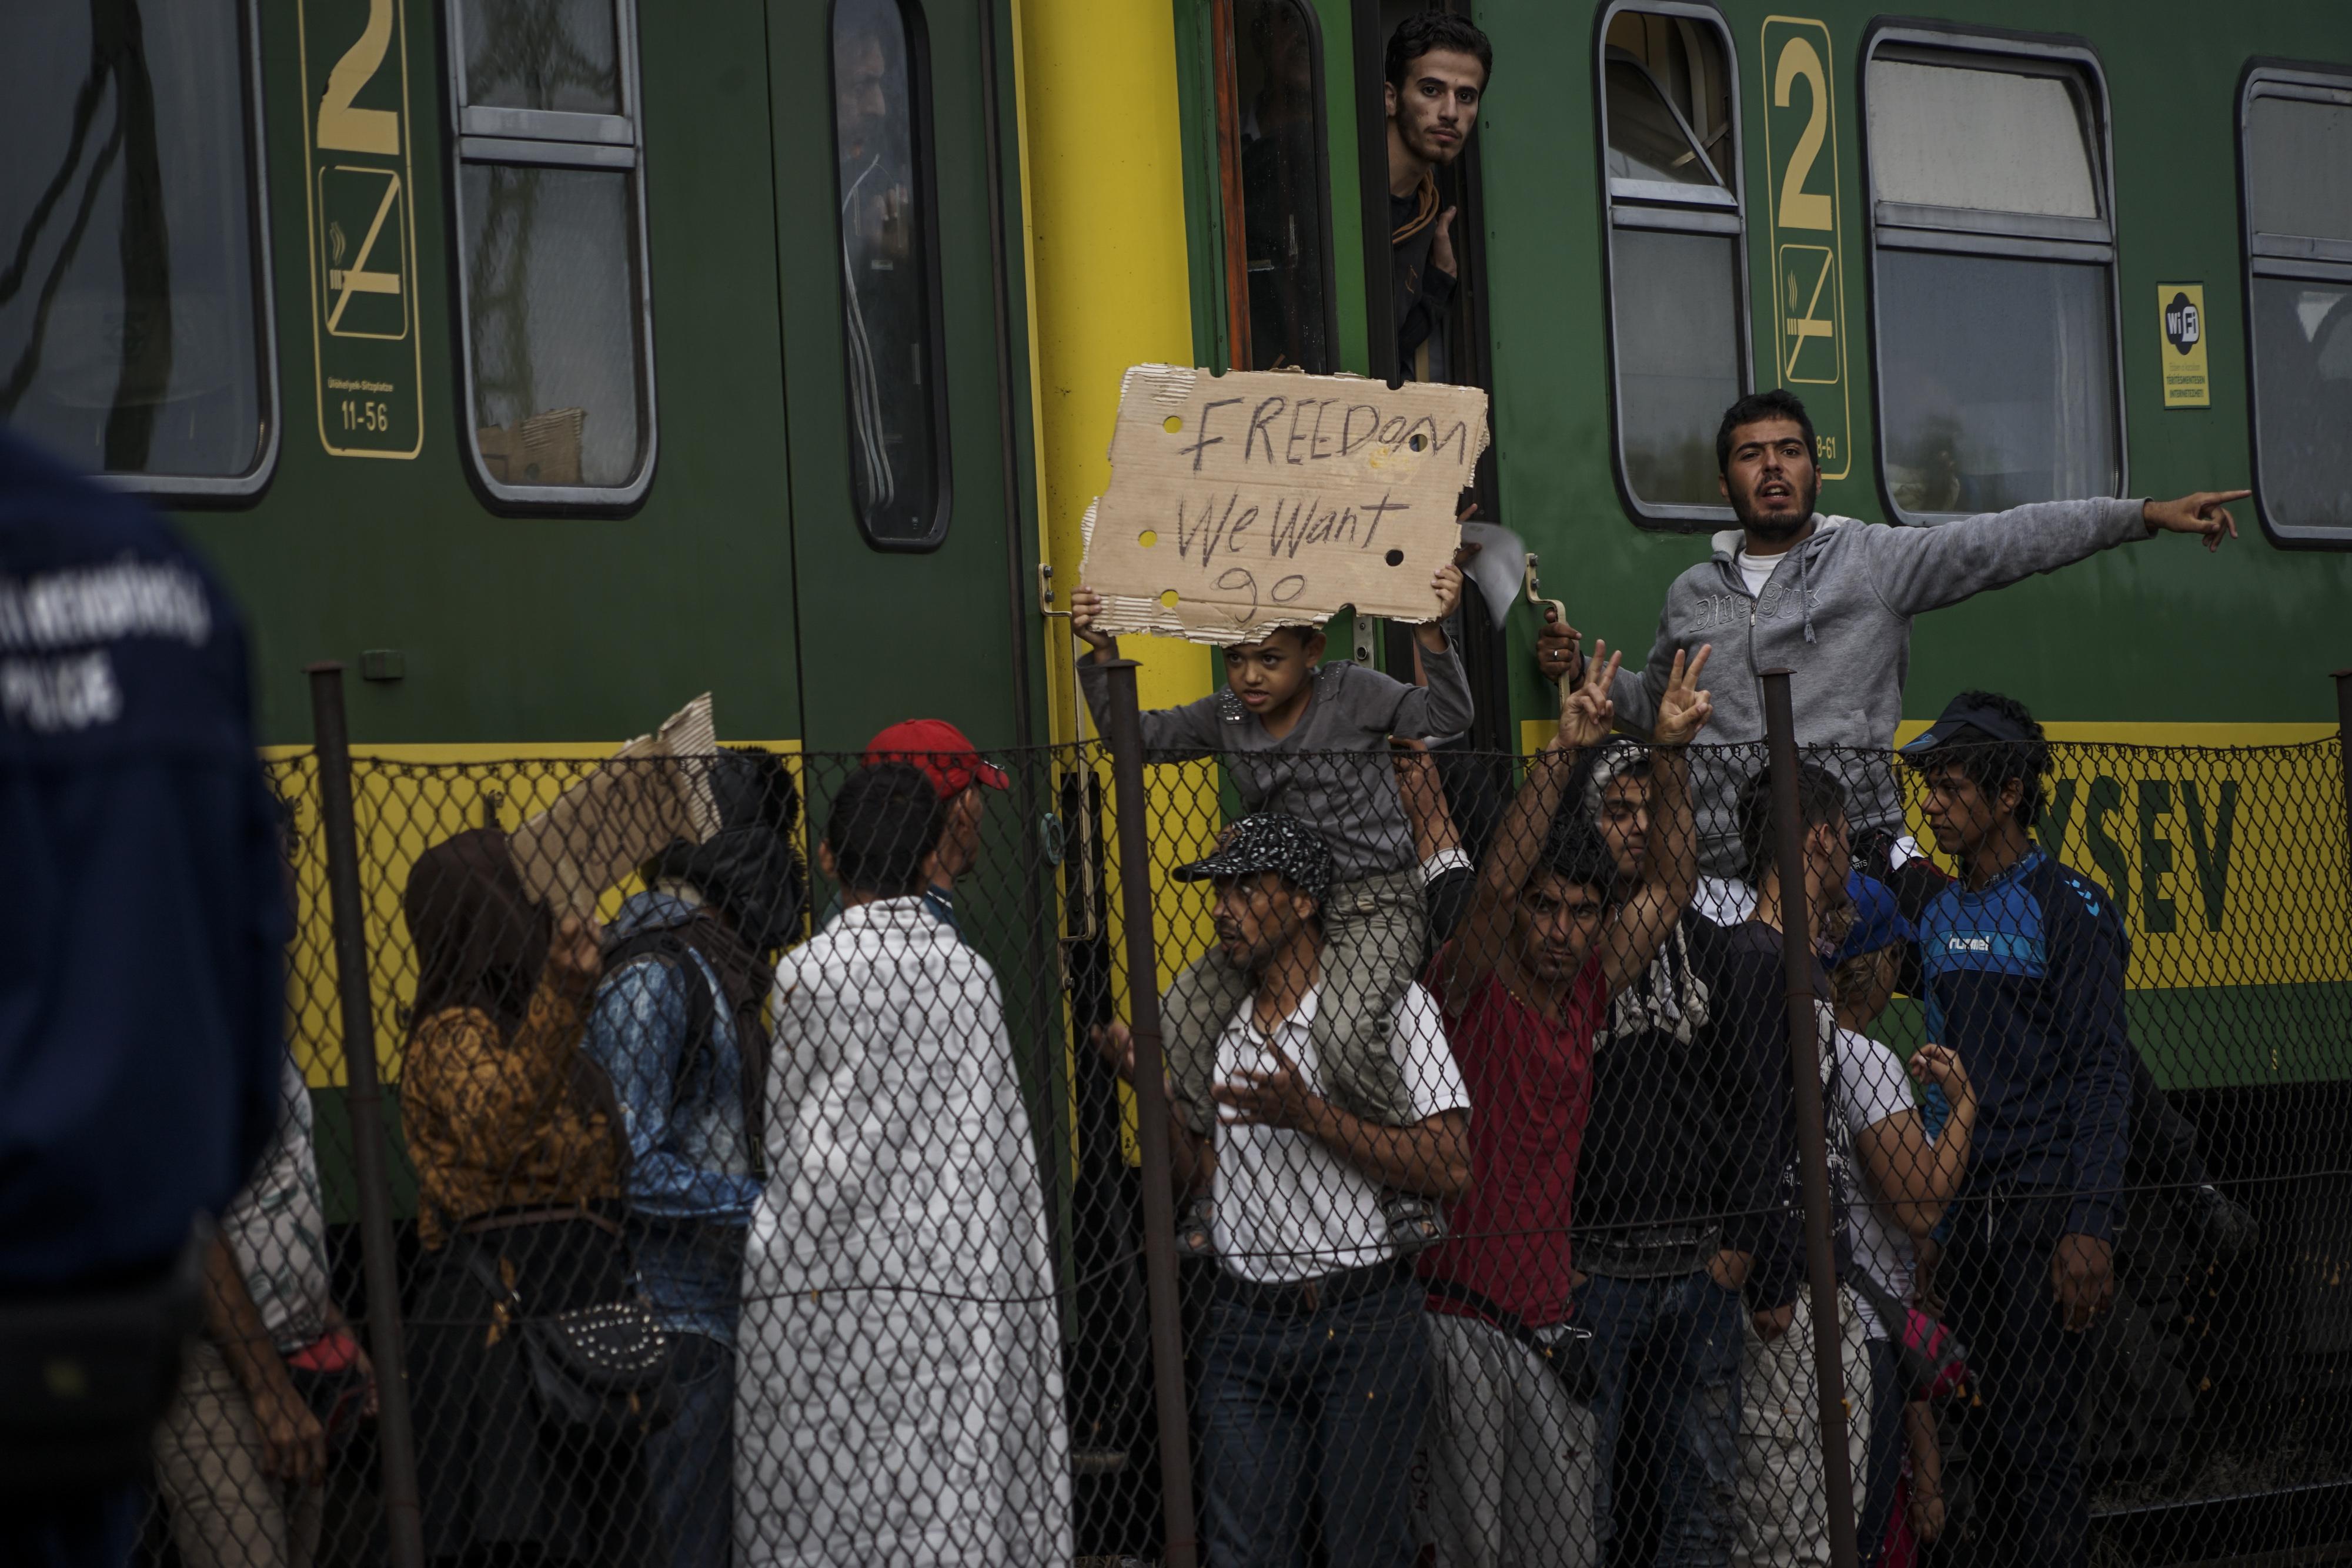 Los refugiados sirios en Guatemala (II parte): Testimonios